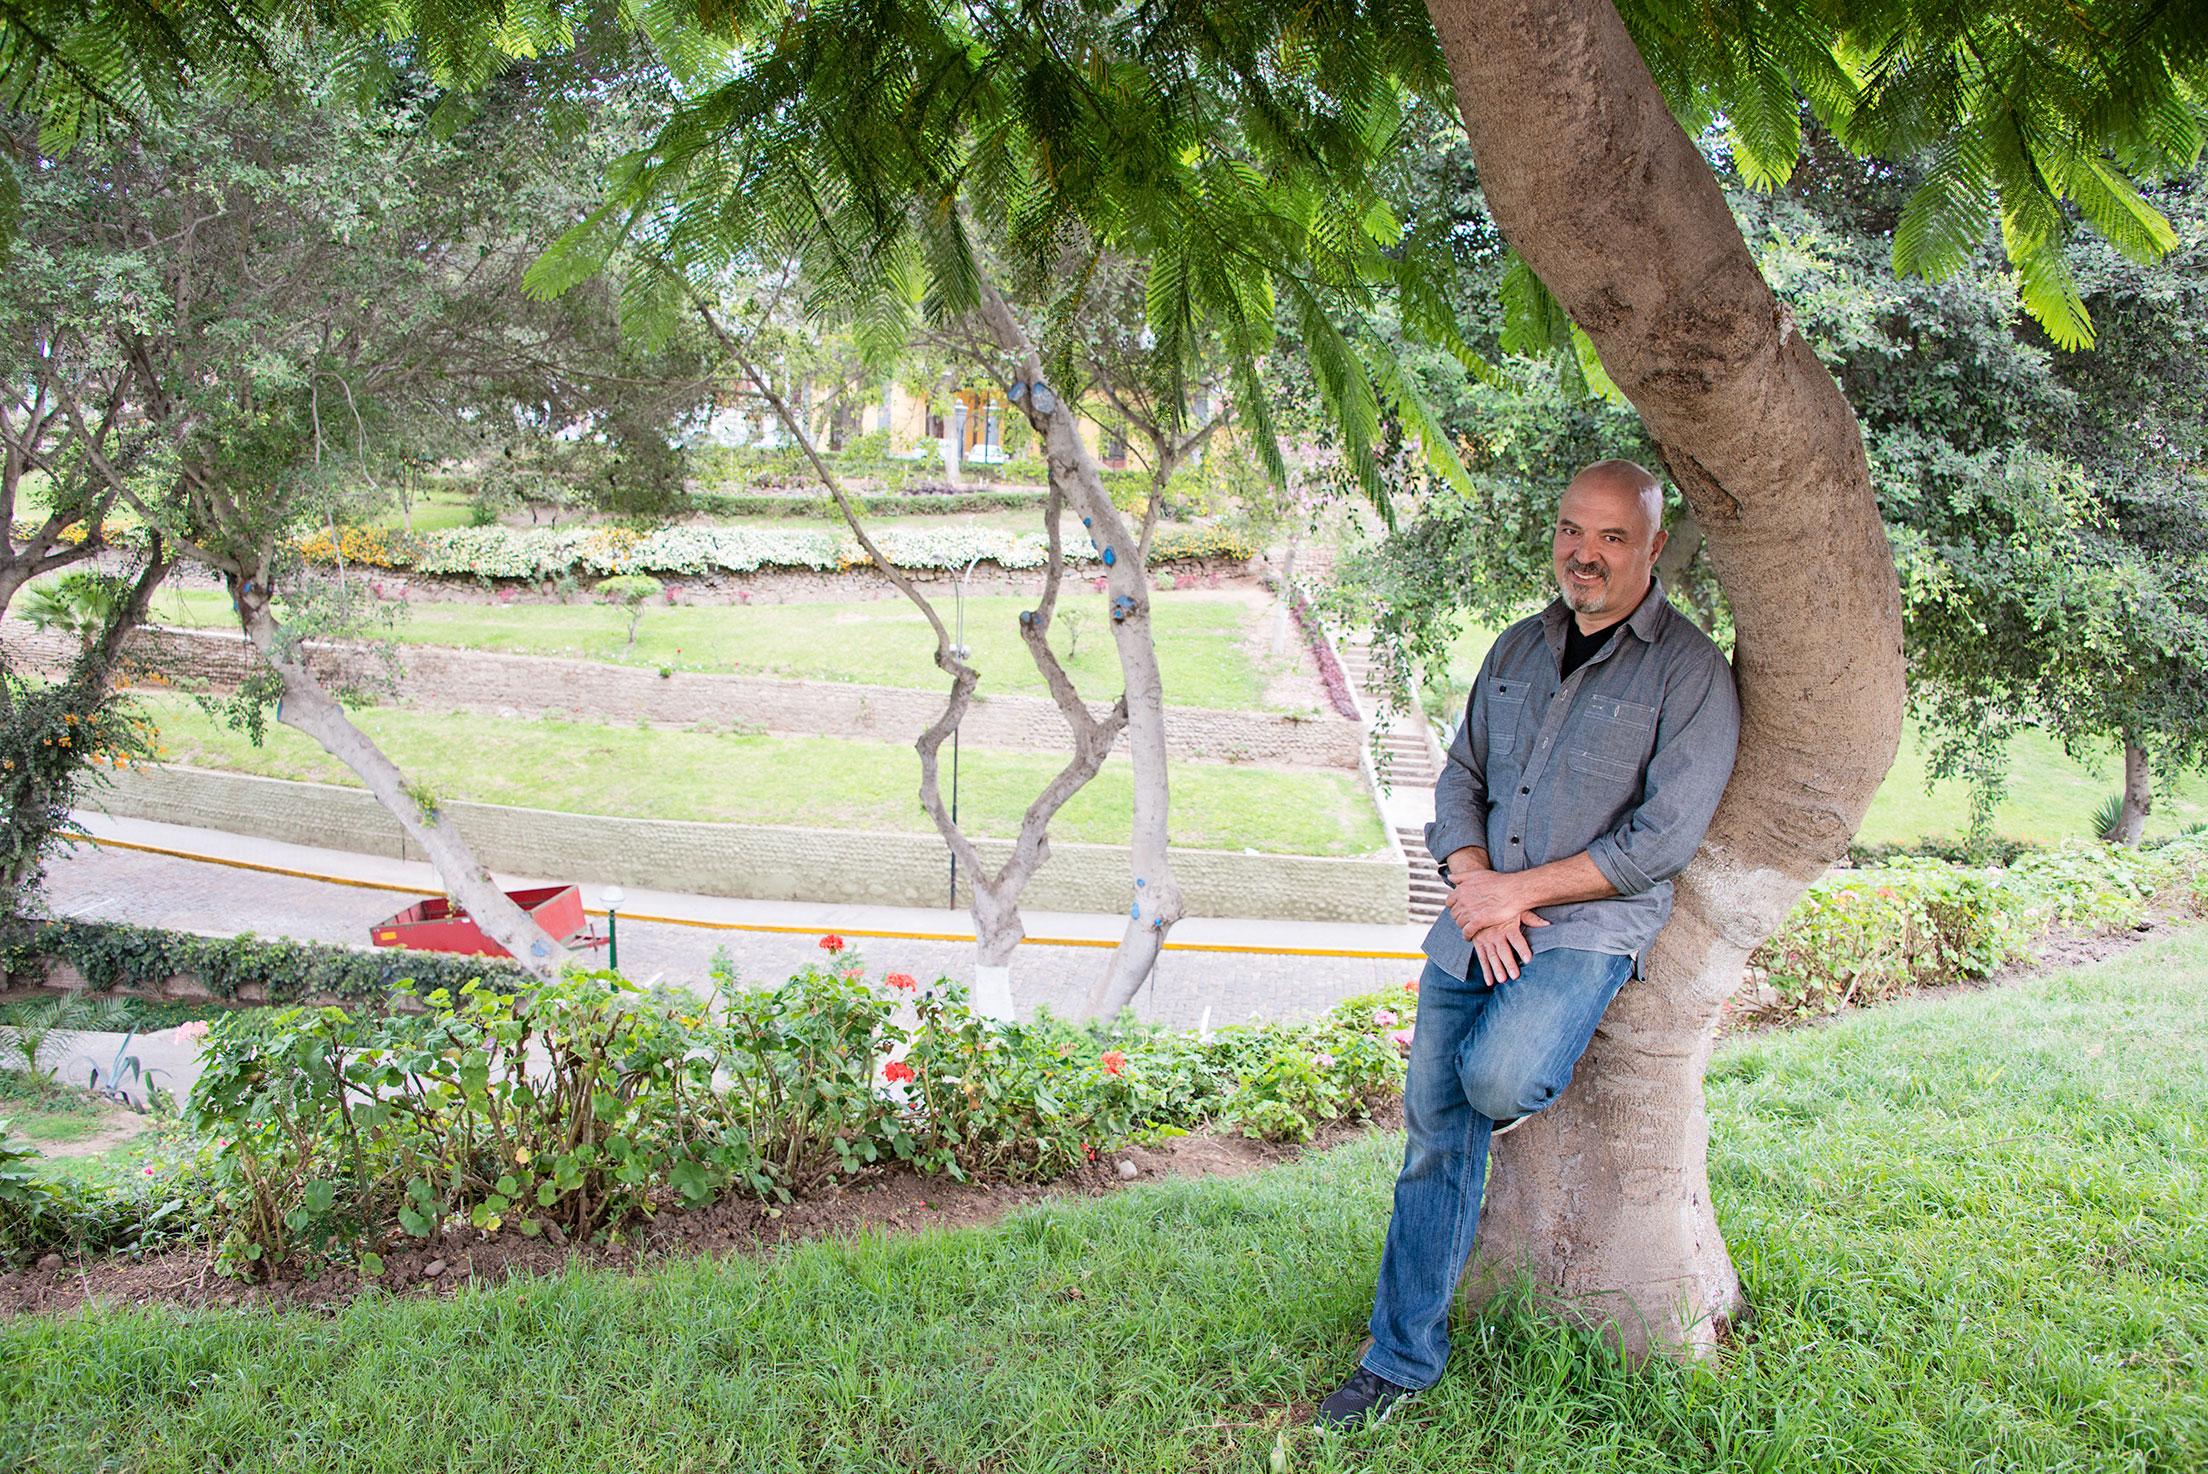 Fabio Resting on a Tree in a Park in Miraflores Lima Peru